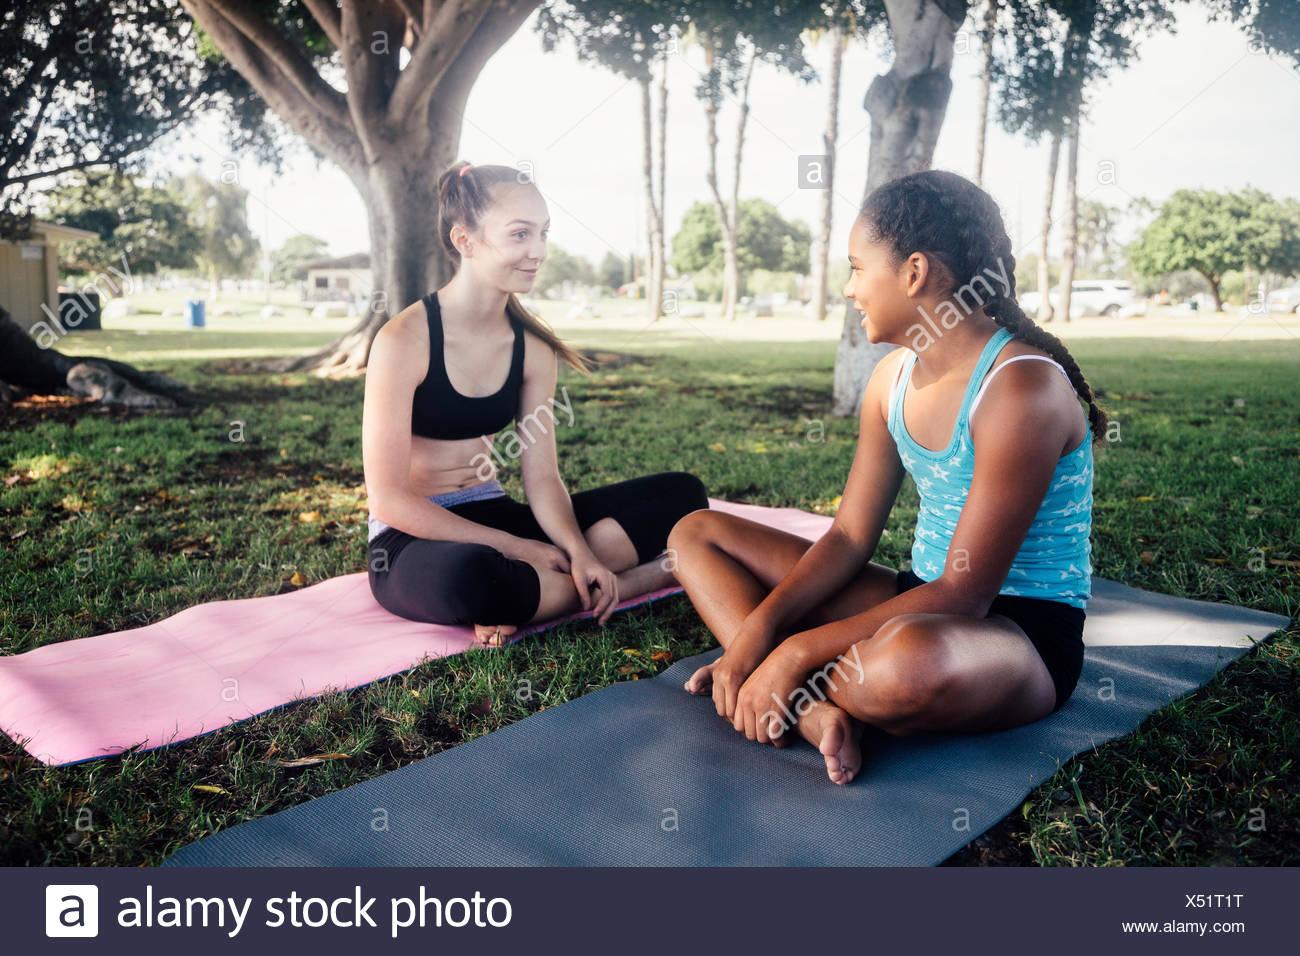 Two schoolgirls chatting on yoga mats on school sports field - Stock Image